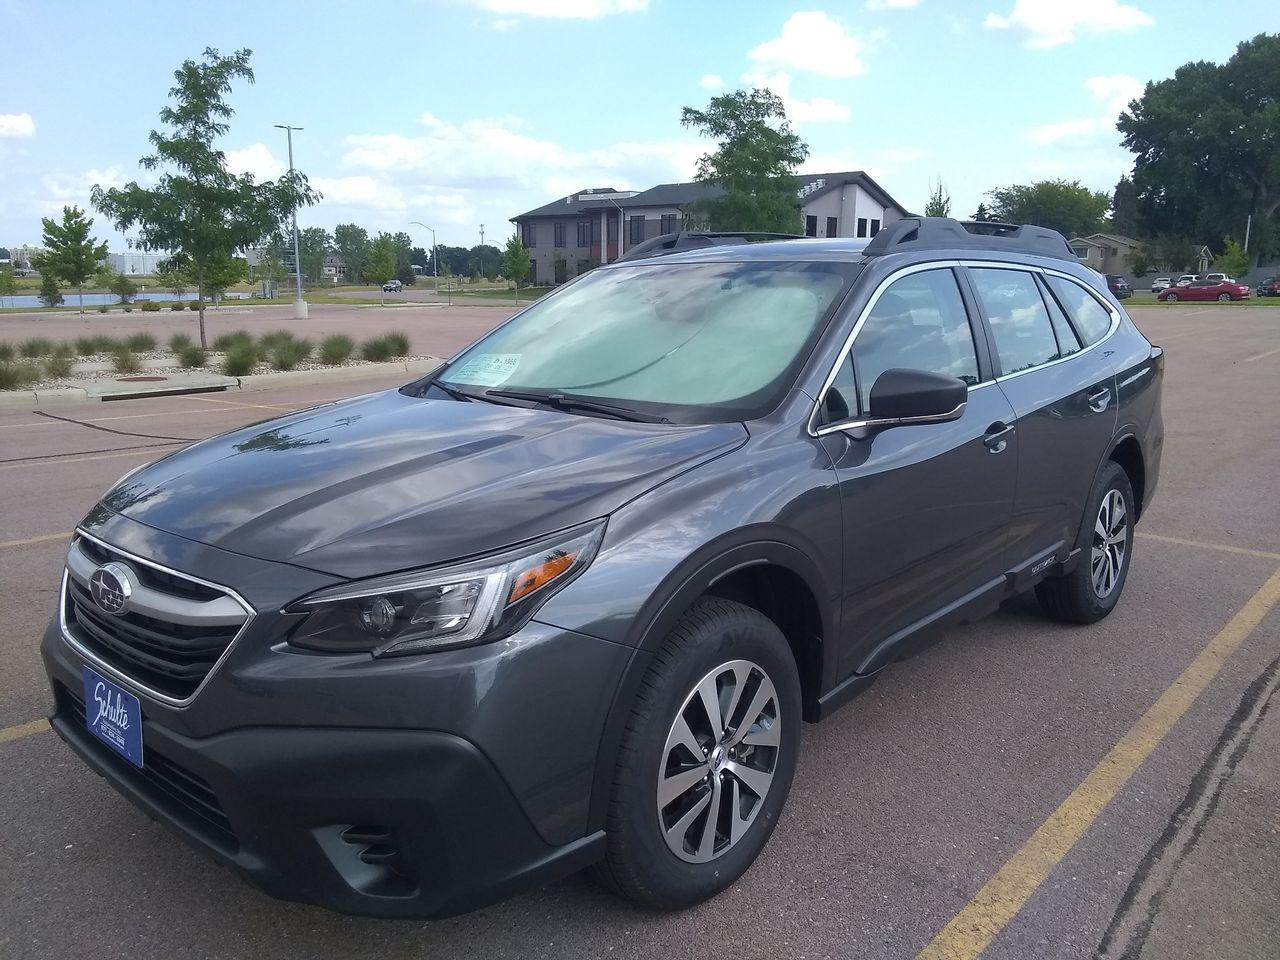 2021 Subaru Outback Base   Sioux Falls, SD, Magnetite Gray Metallic (Gray), All Wheel